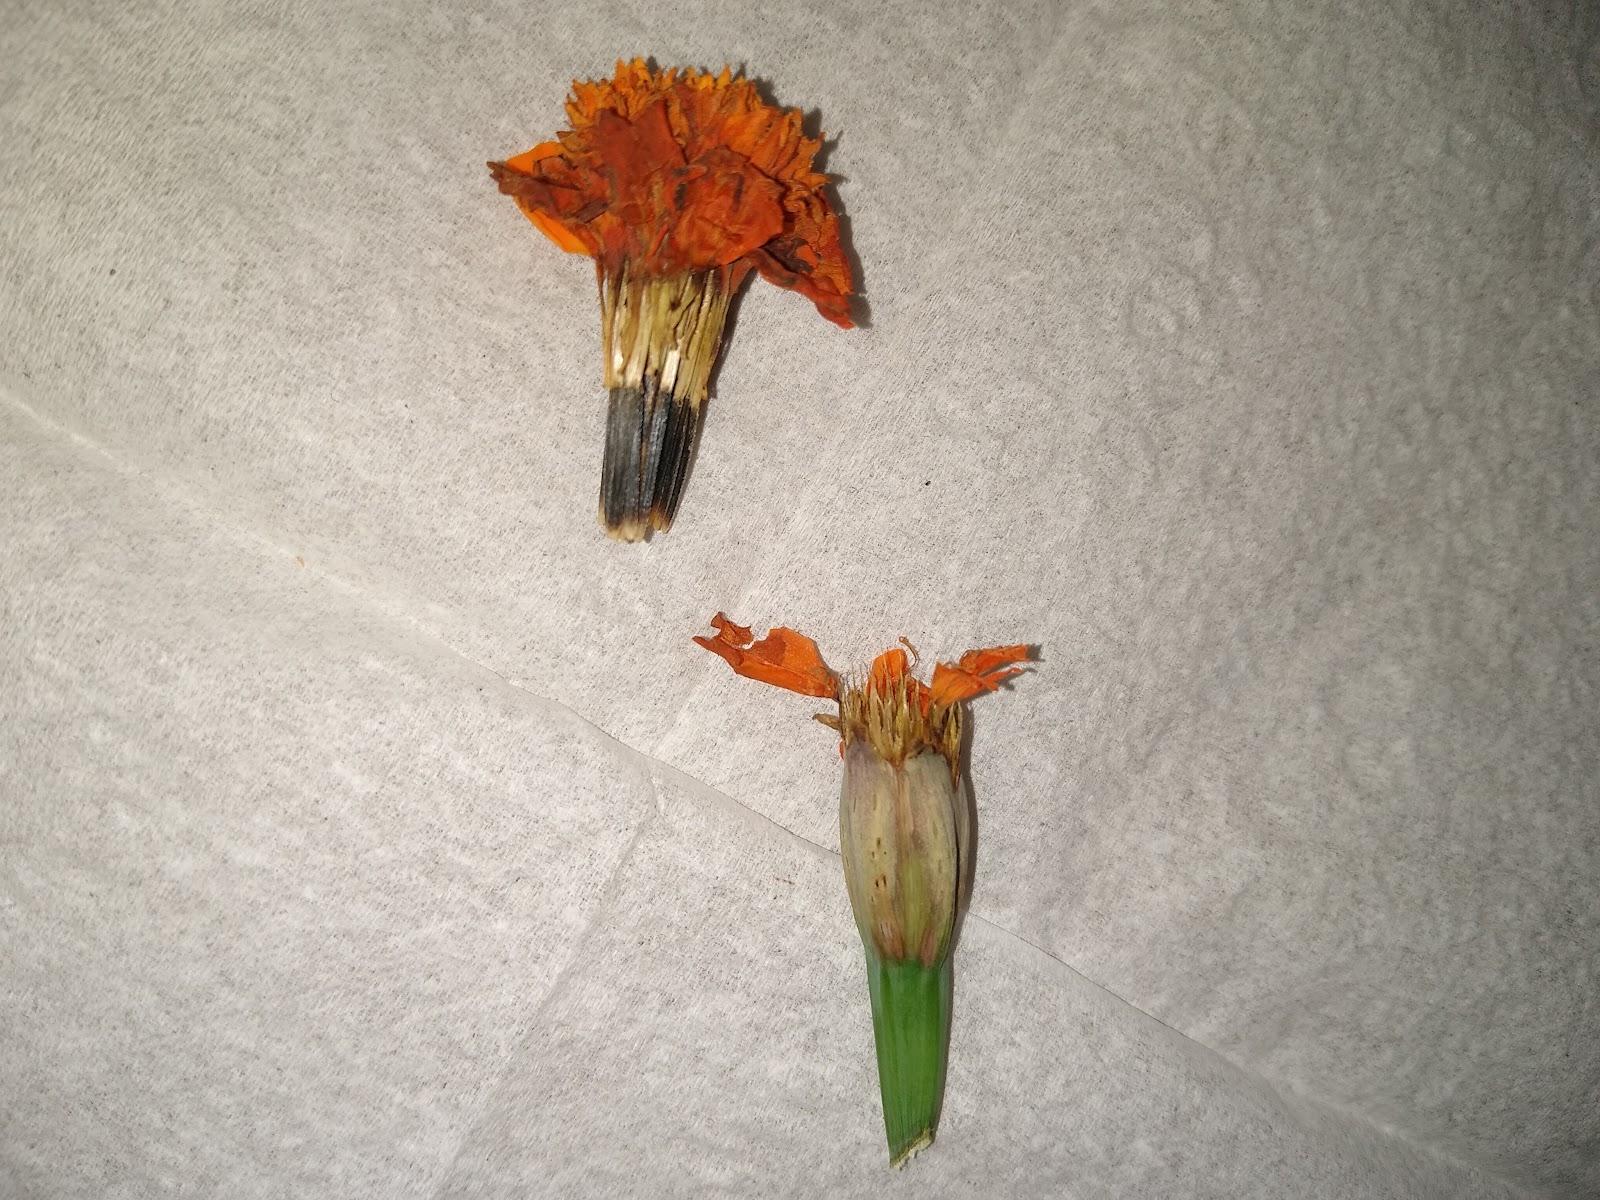 harvesting marigold seeds image